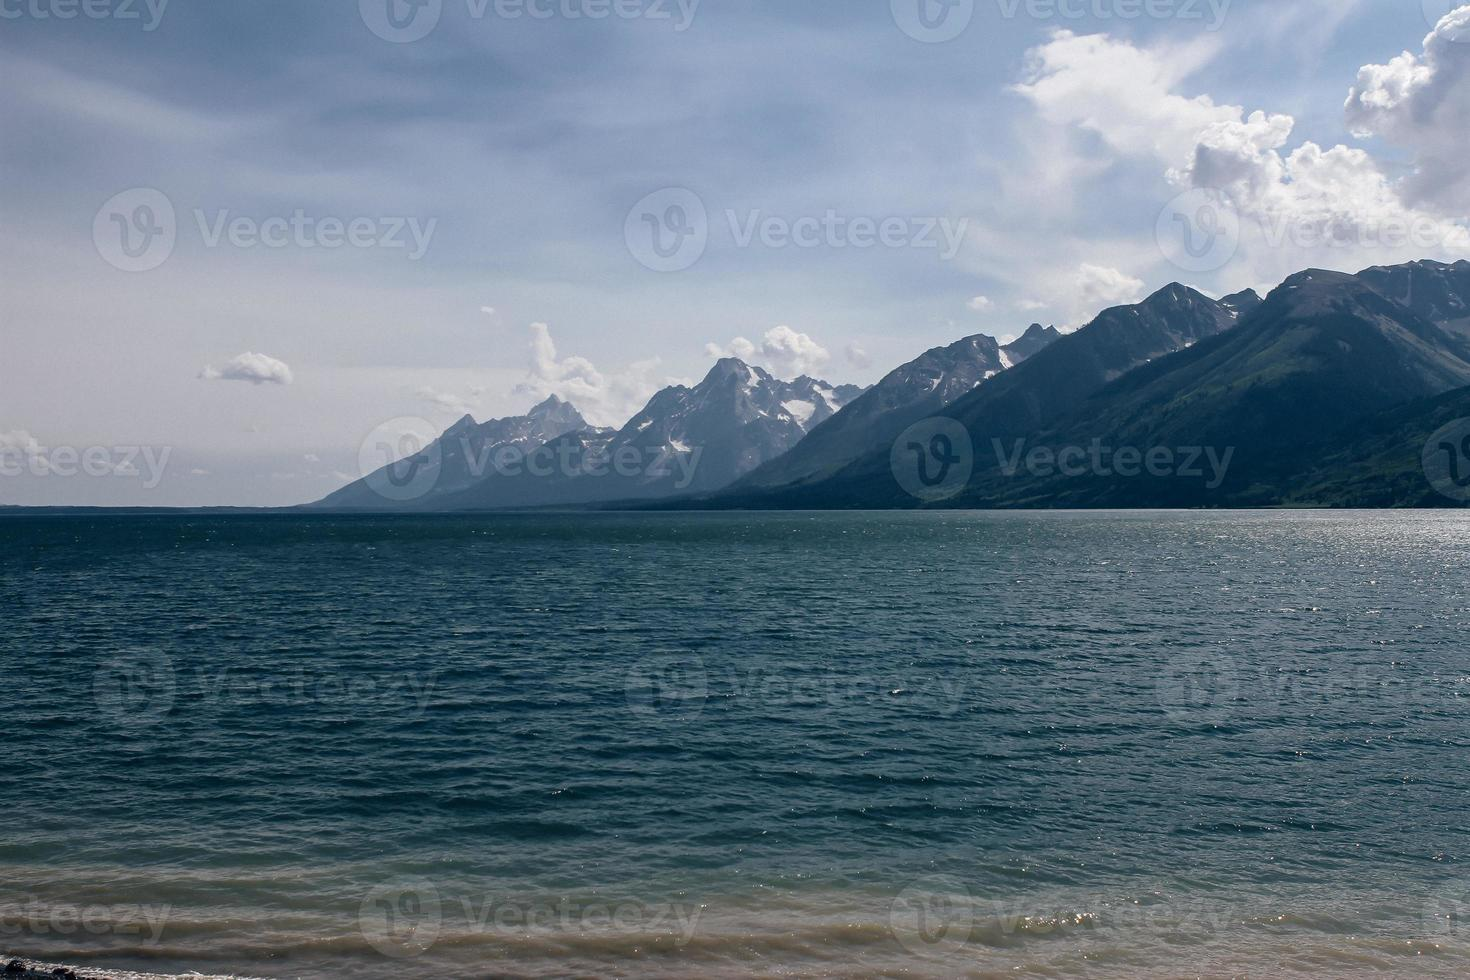 Gletscherberge in der Ferne große kristallblaue Seebasis bewölkt foto